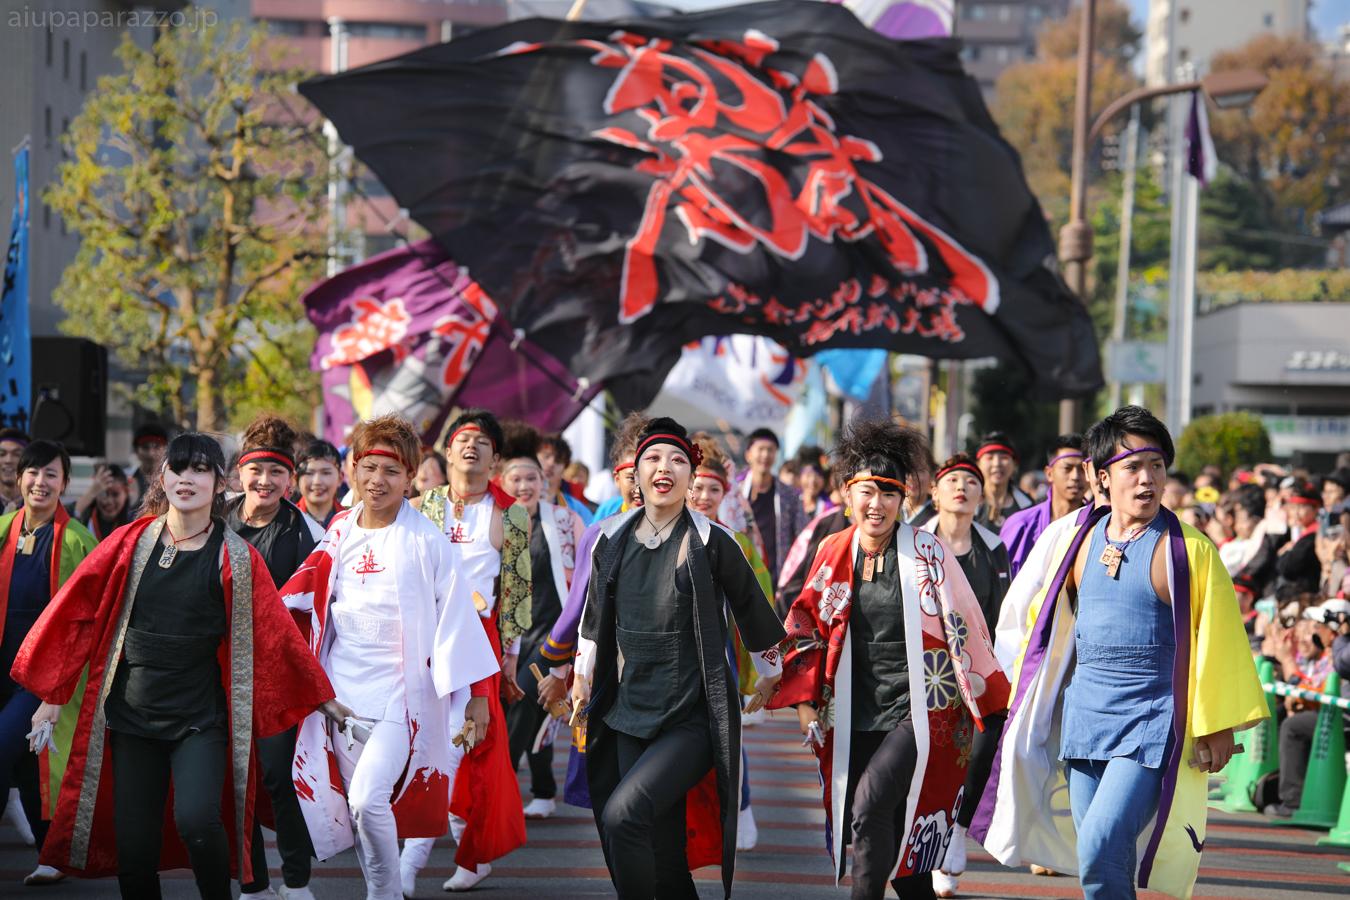 kanpachi2016oyachai-36.jpg